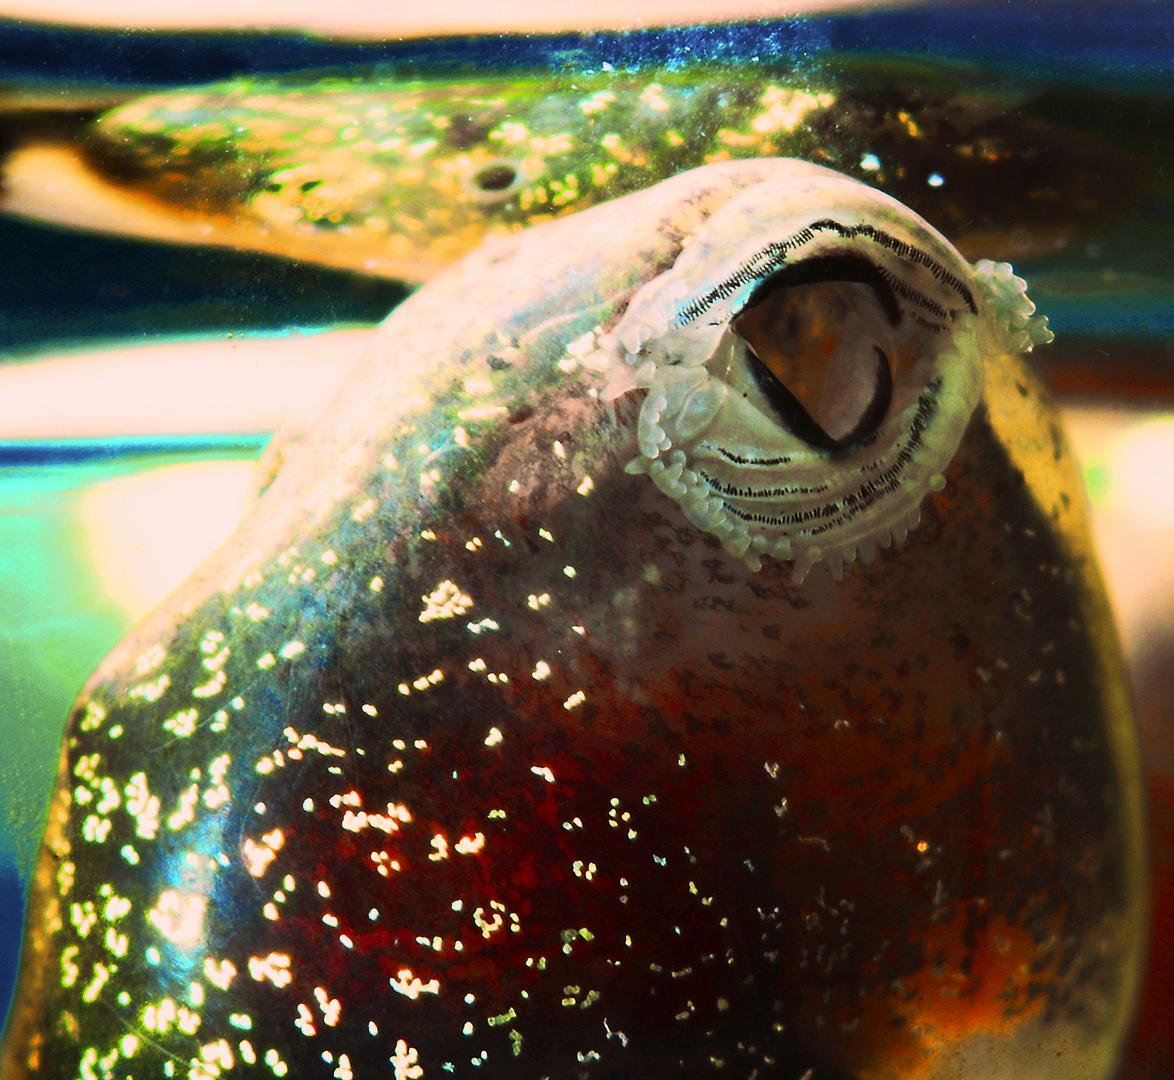 Kaulquappenmaul (Grasfrosch, rana temporaria)